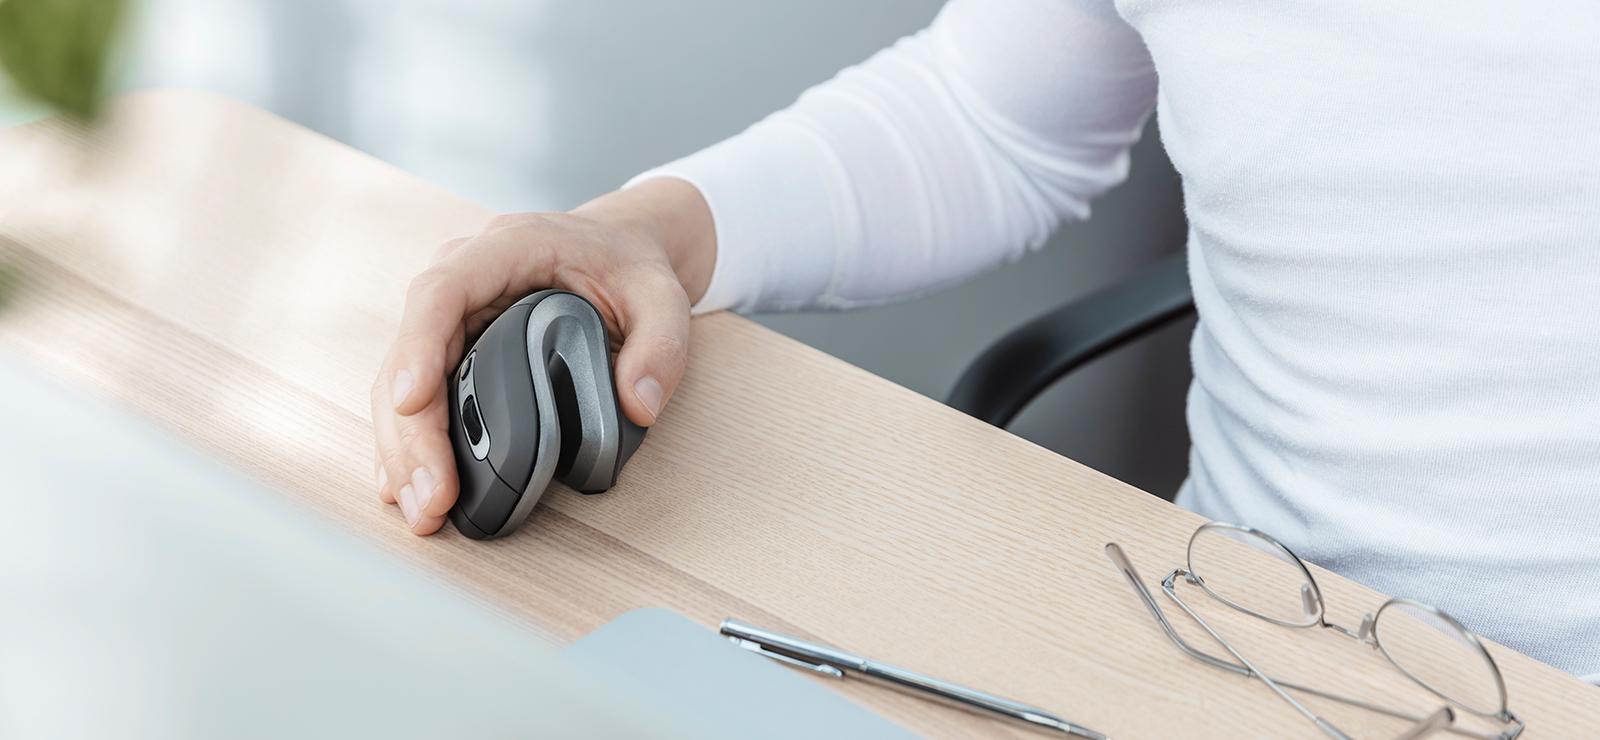 B2B office ergonomic header